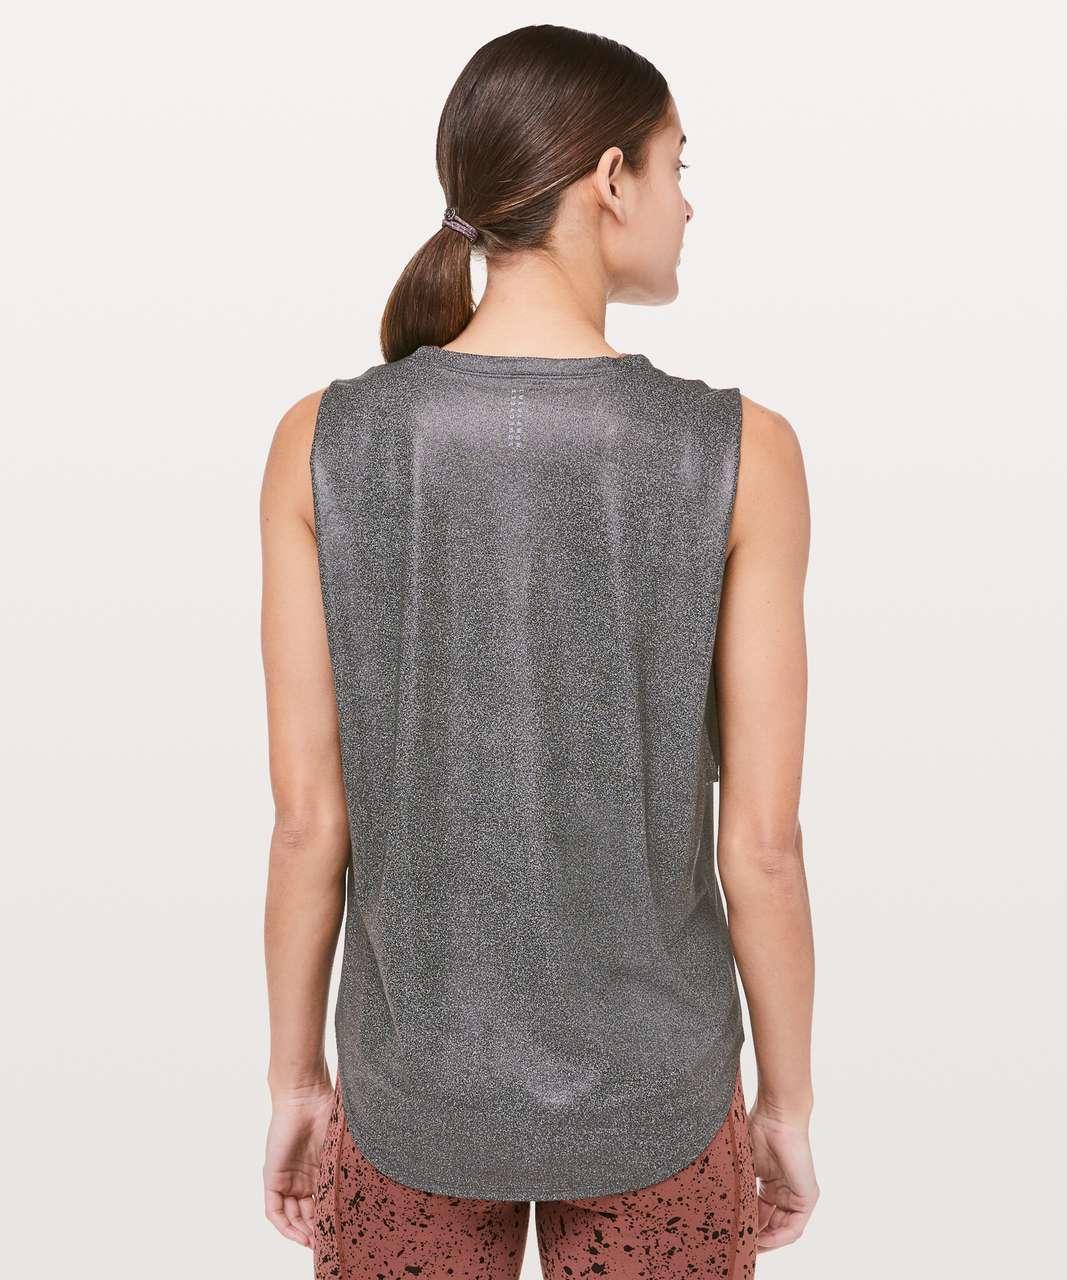 Lululemon Ride & Reflect Muscle Tank *lululemon X SoulCycle - Luminosity Foil Print Heathered Black Black